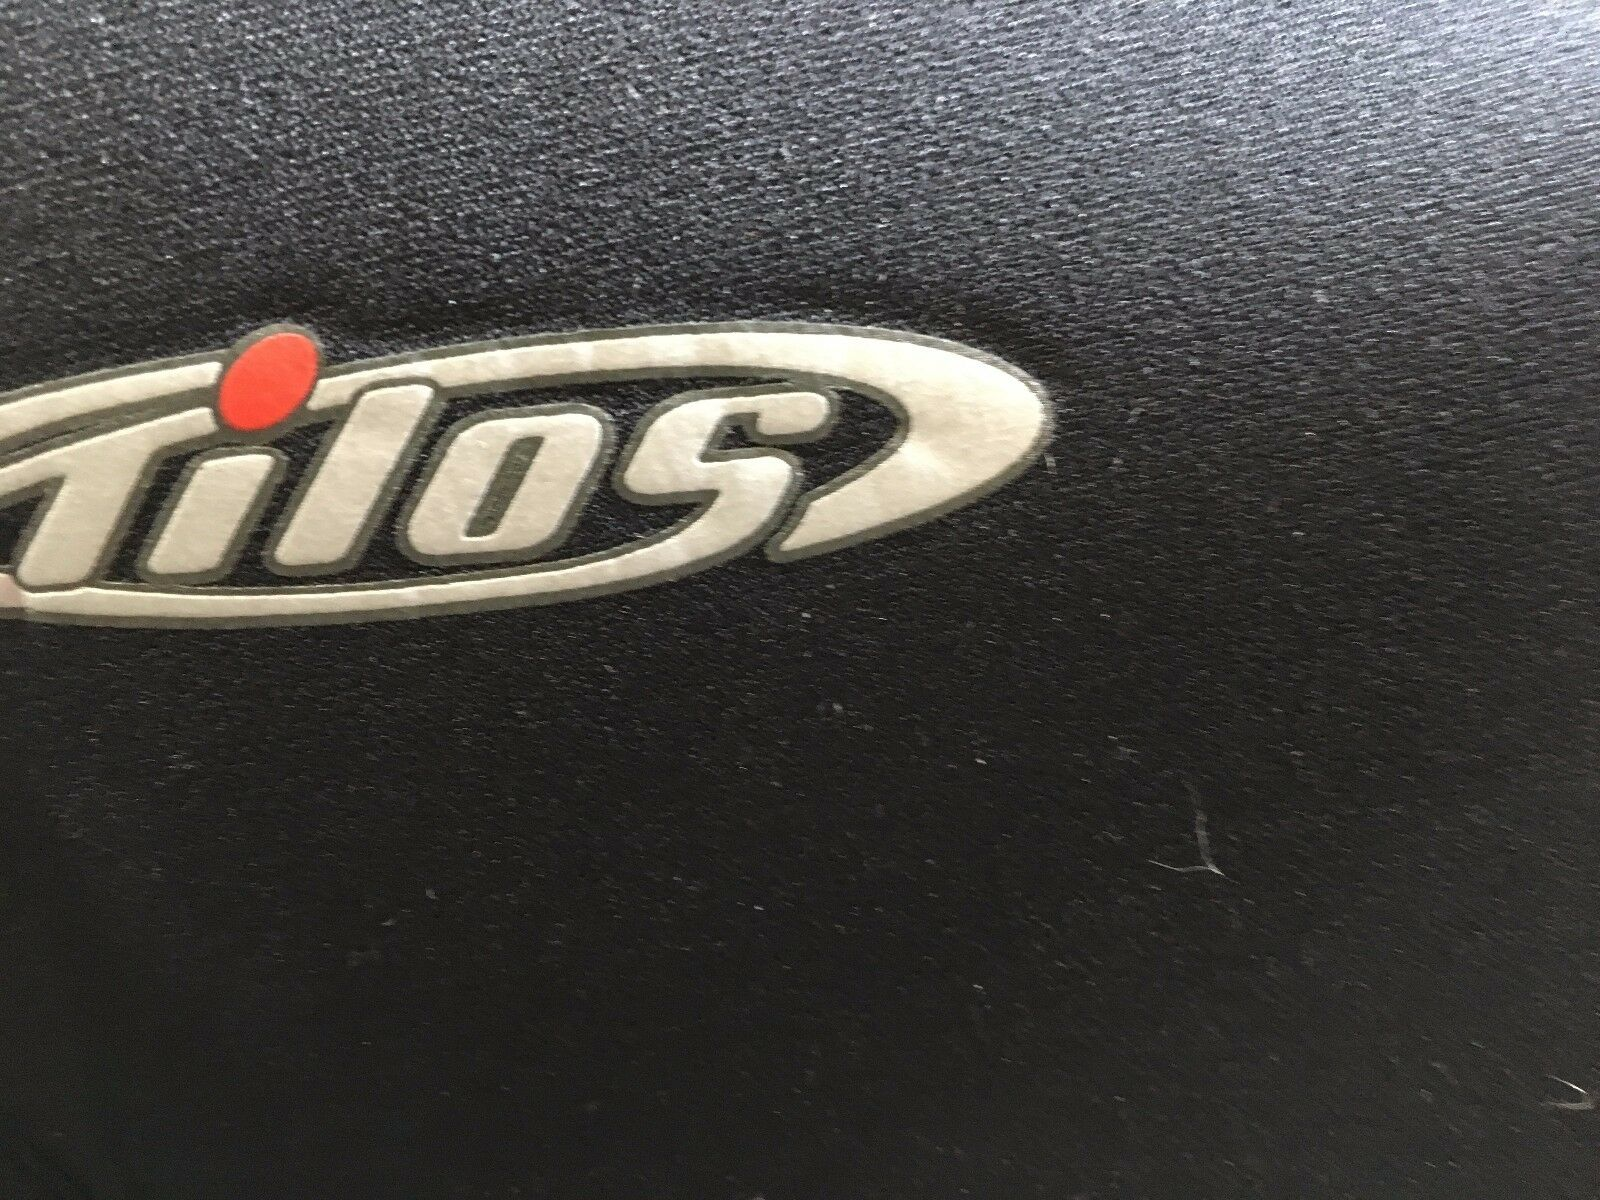 1mm Tilos Tilos Tilos Overall Taucheranzug Shorts Gerätetauchen Wasser Neoprenanzug 43dcc7